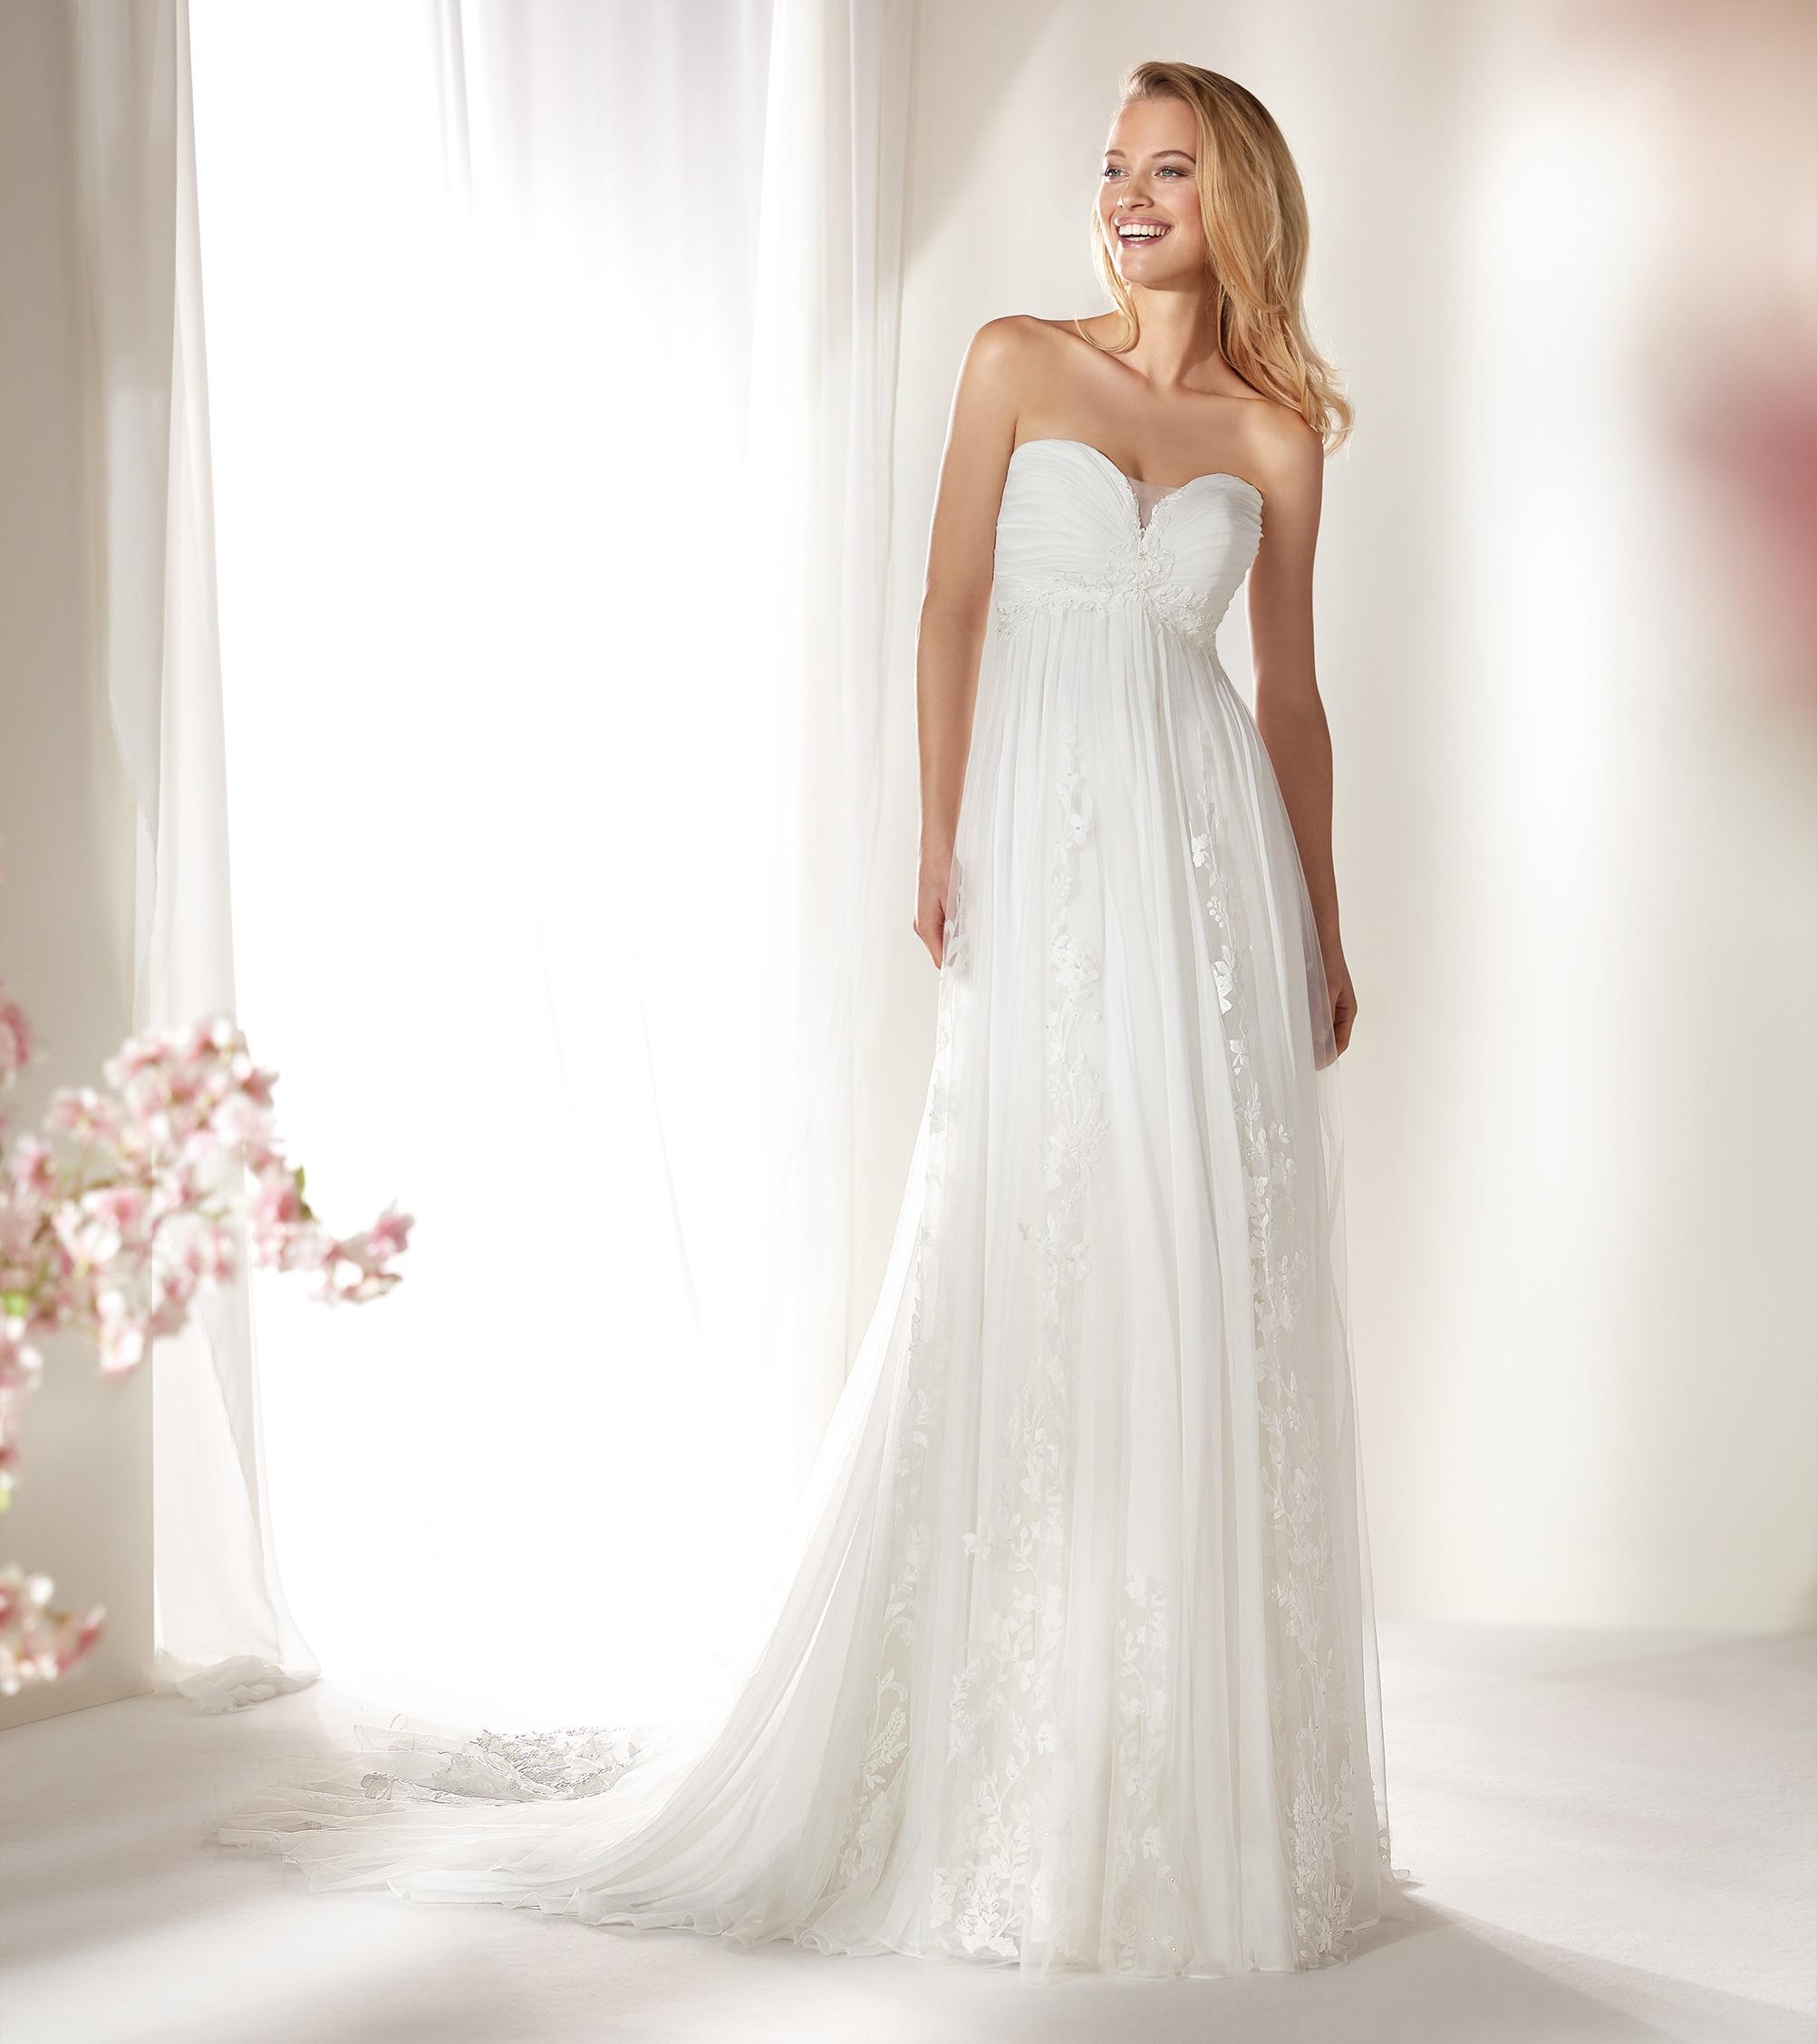 COAB19220 menyasszonyi ruha - NICOLE SPOSE Milano kollekció